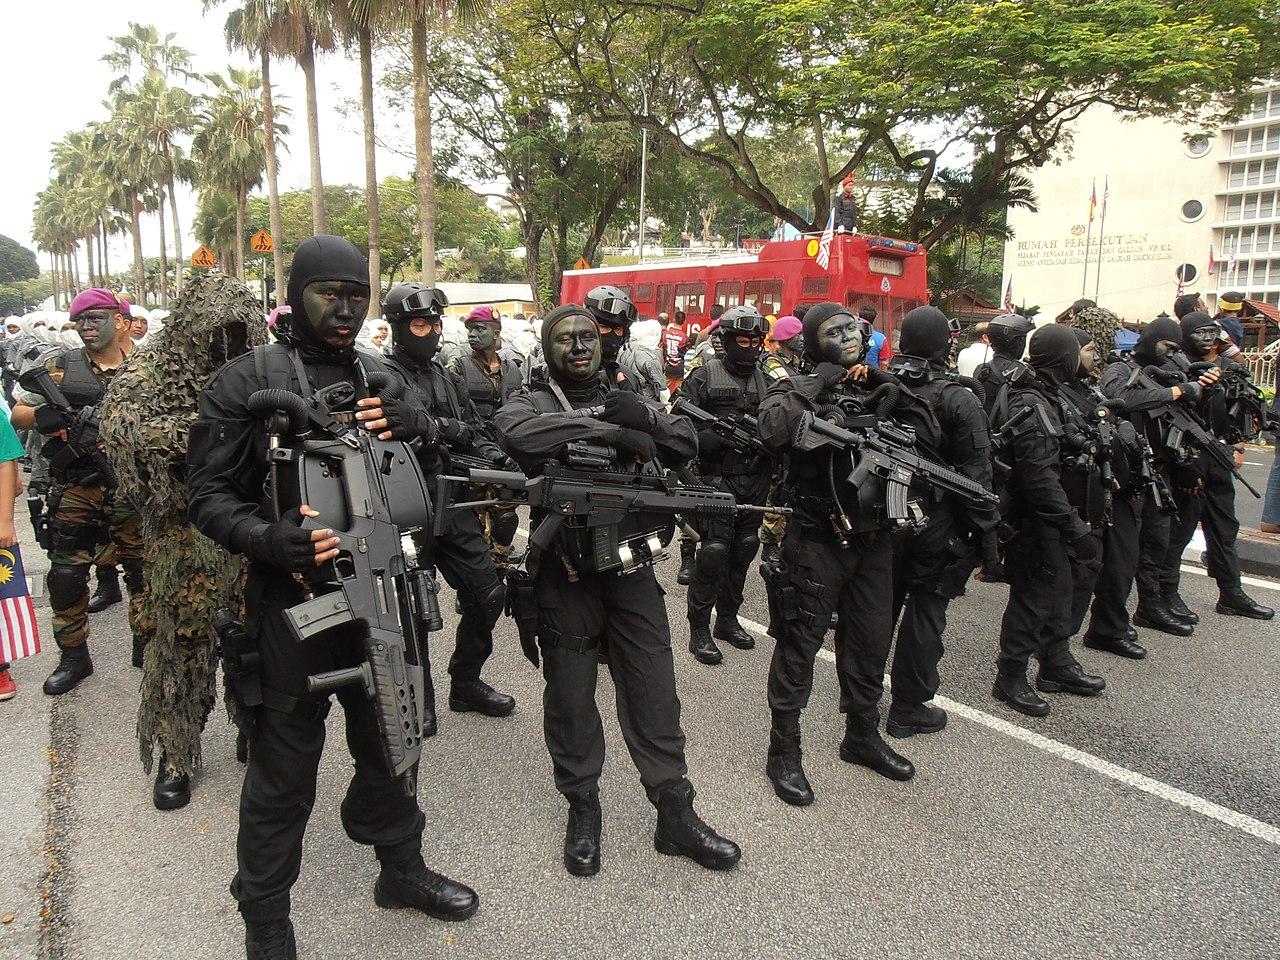 wallpaper polis diraja malaysia